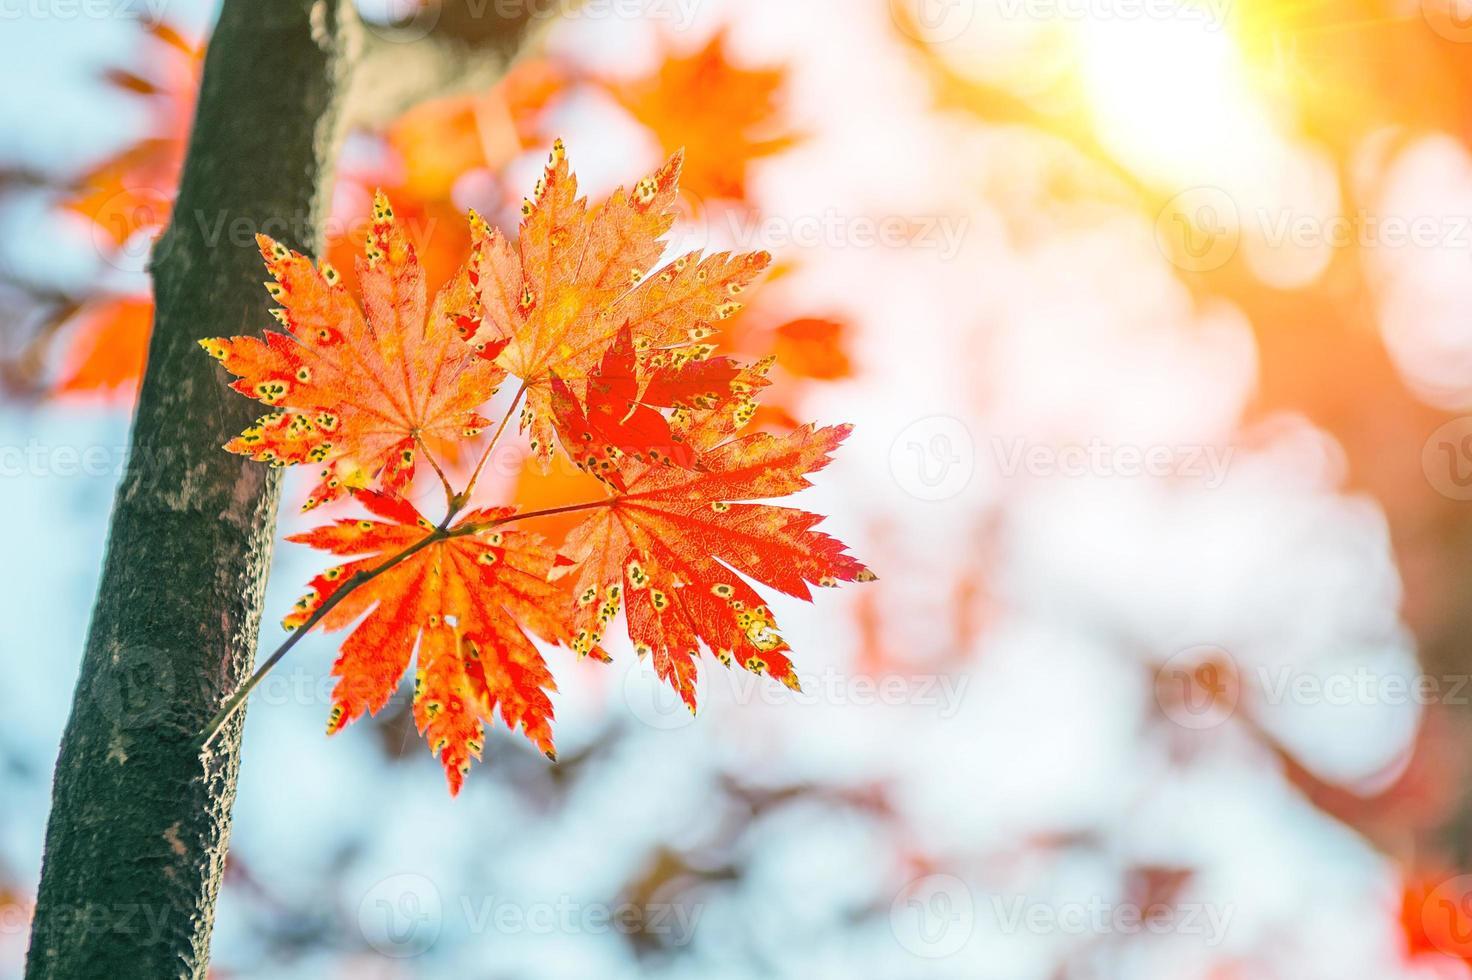 Hoja de arce en otoño en Corea. foto